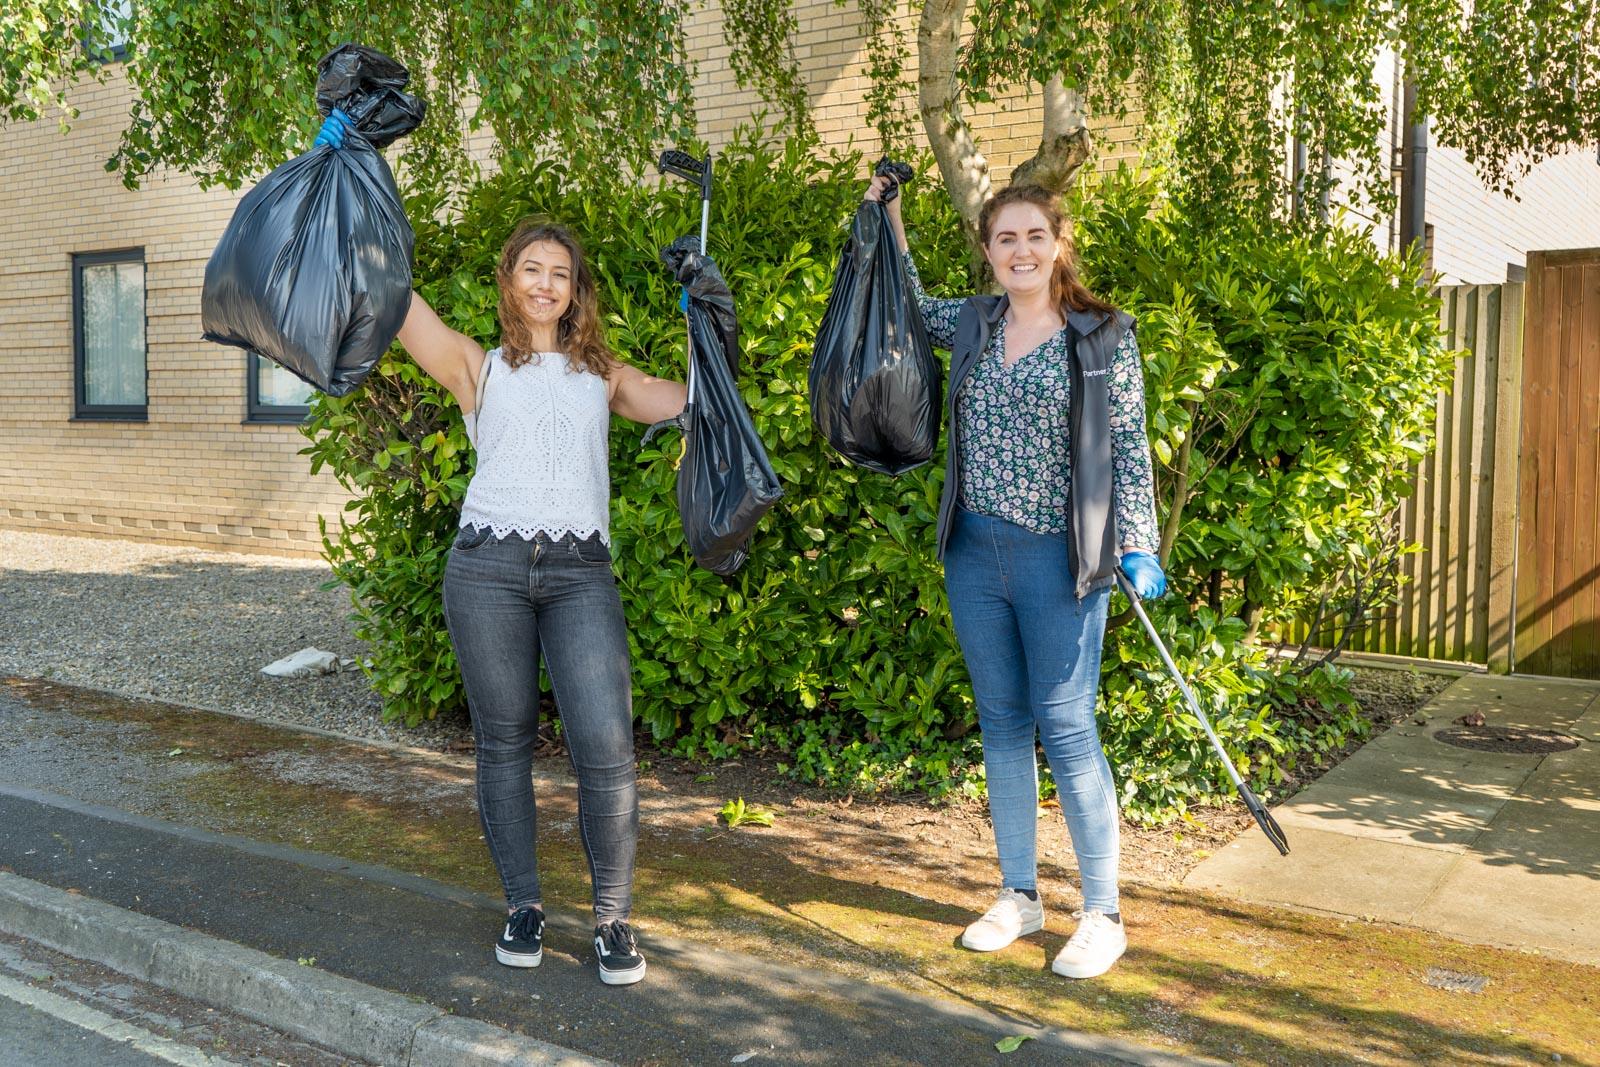 VetPartners litter-pick volunteers clean up neighbourhood